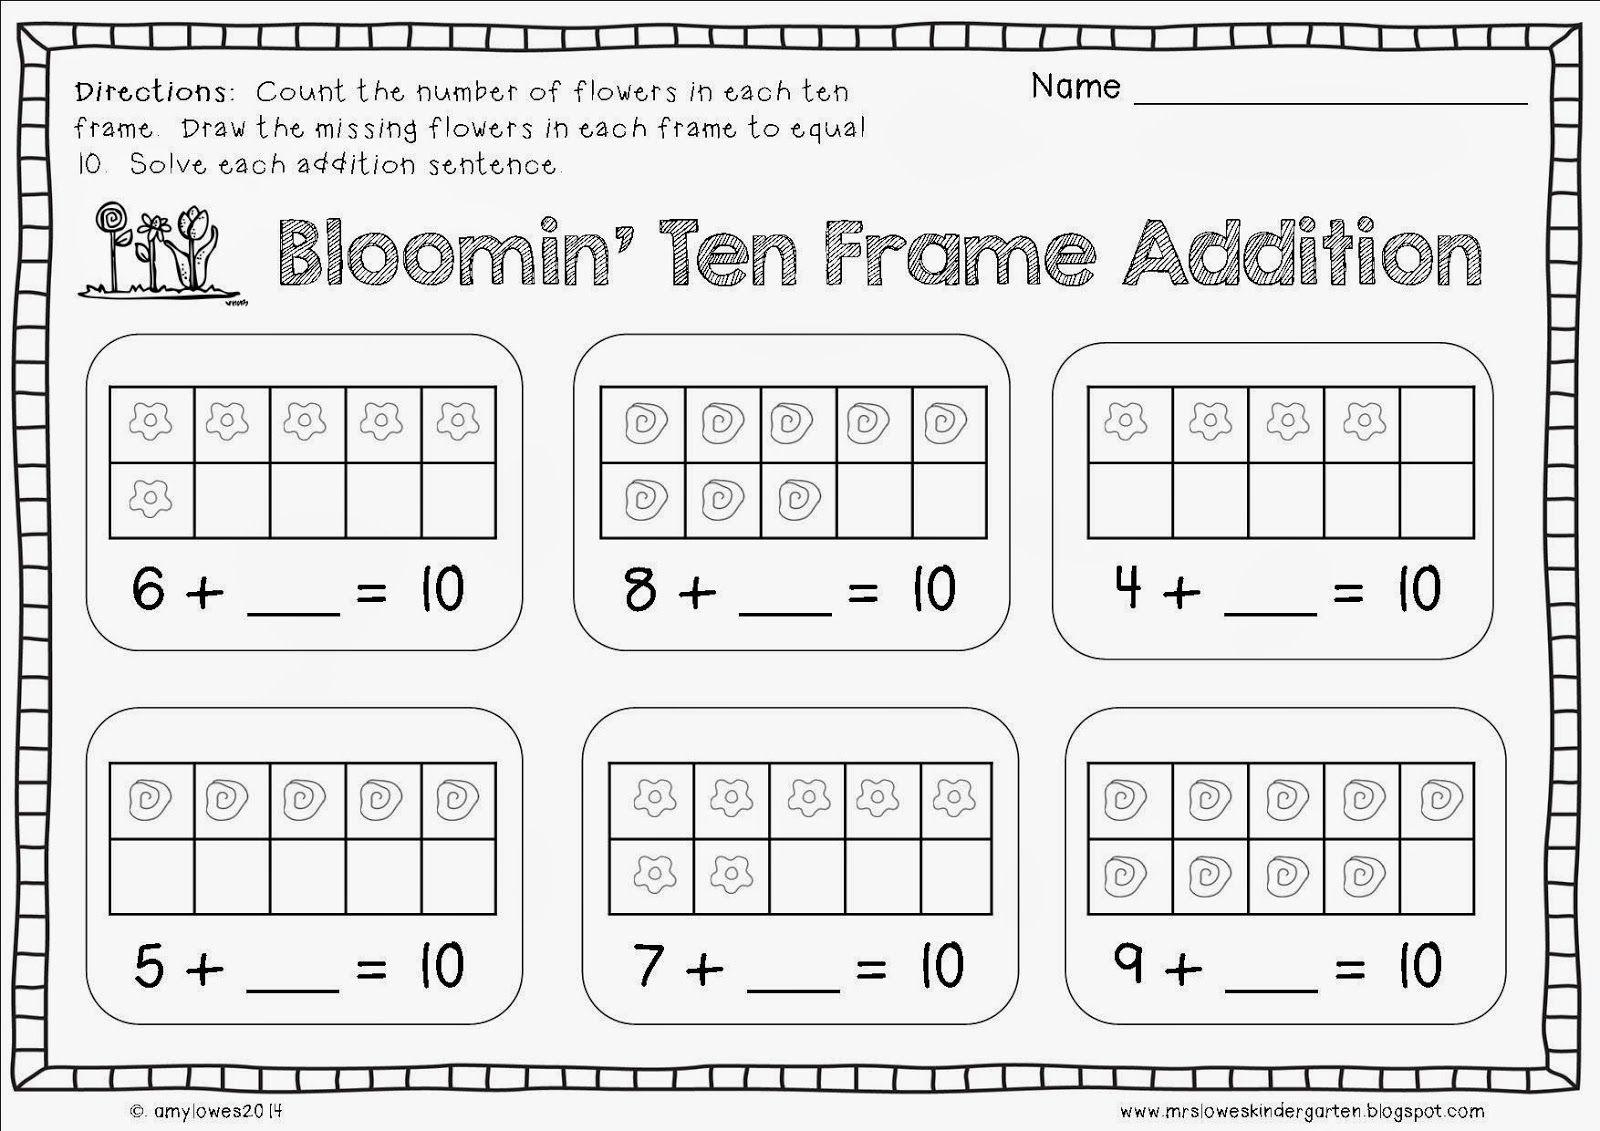 Bloomin Ten Frame Addition